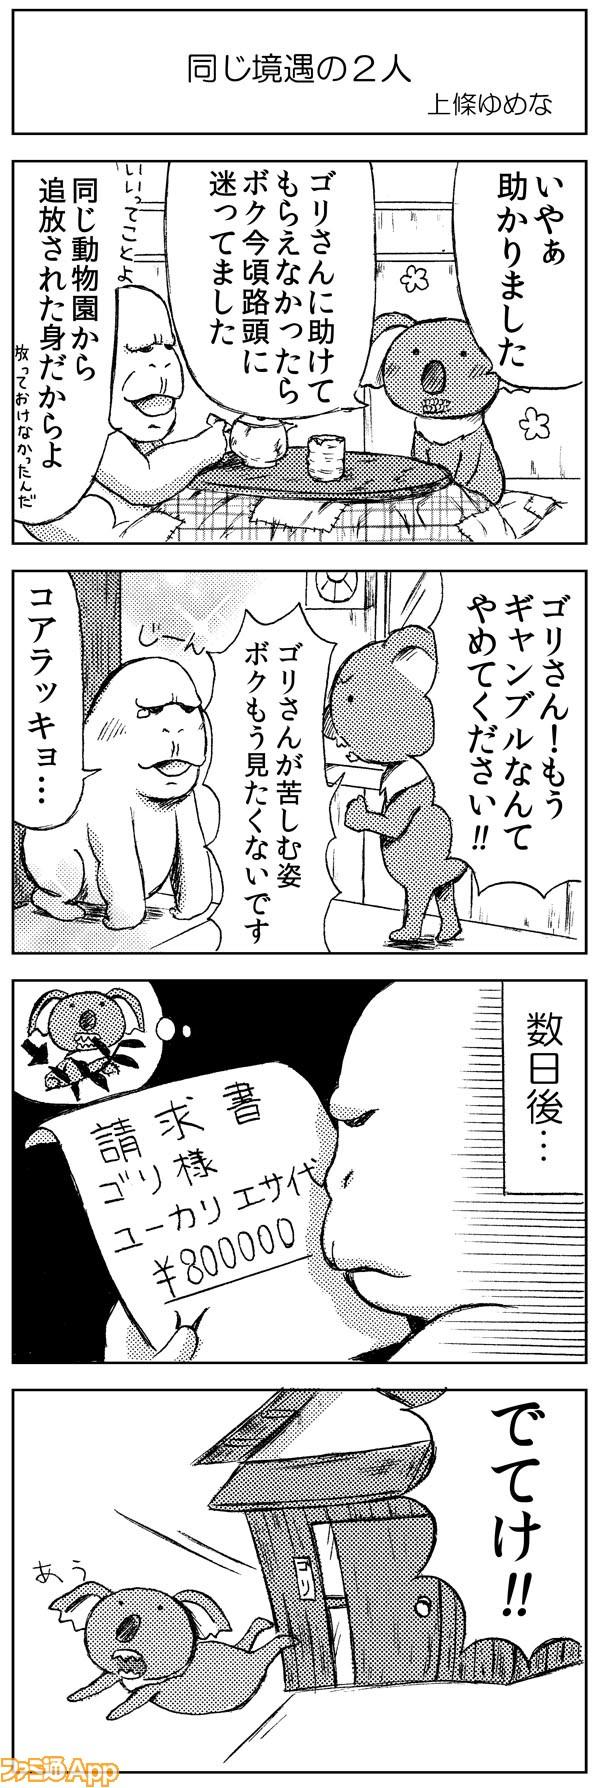 03kami_077